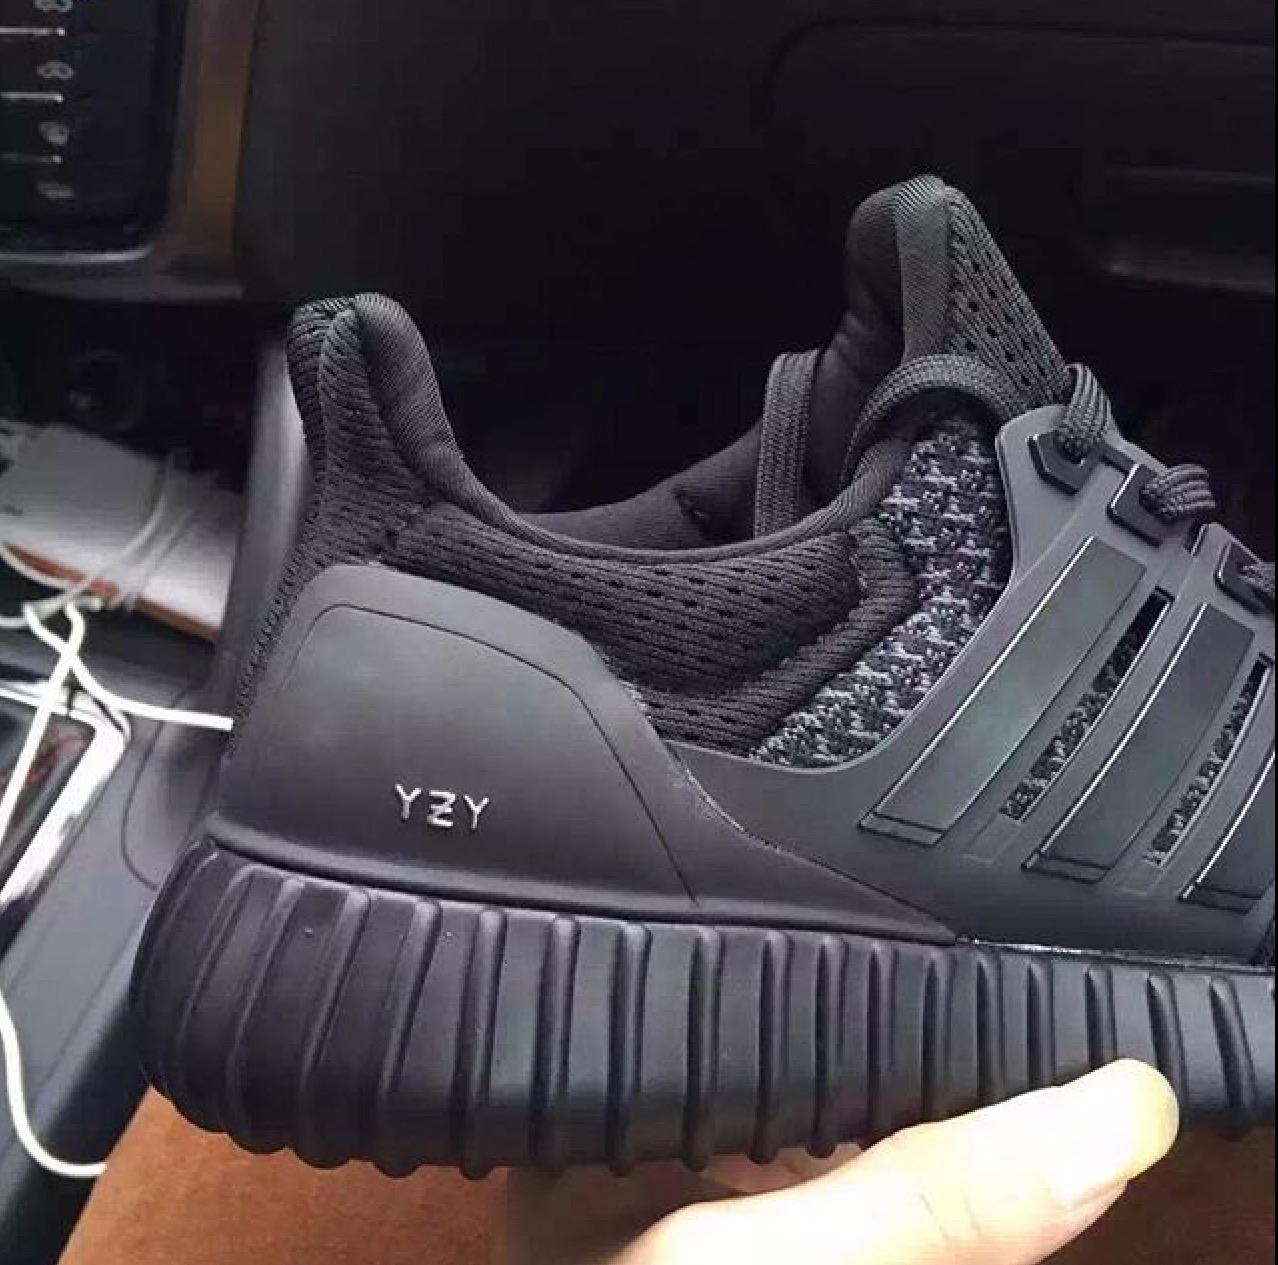 adidas-yeezy-ultra-boost